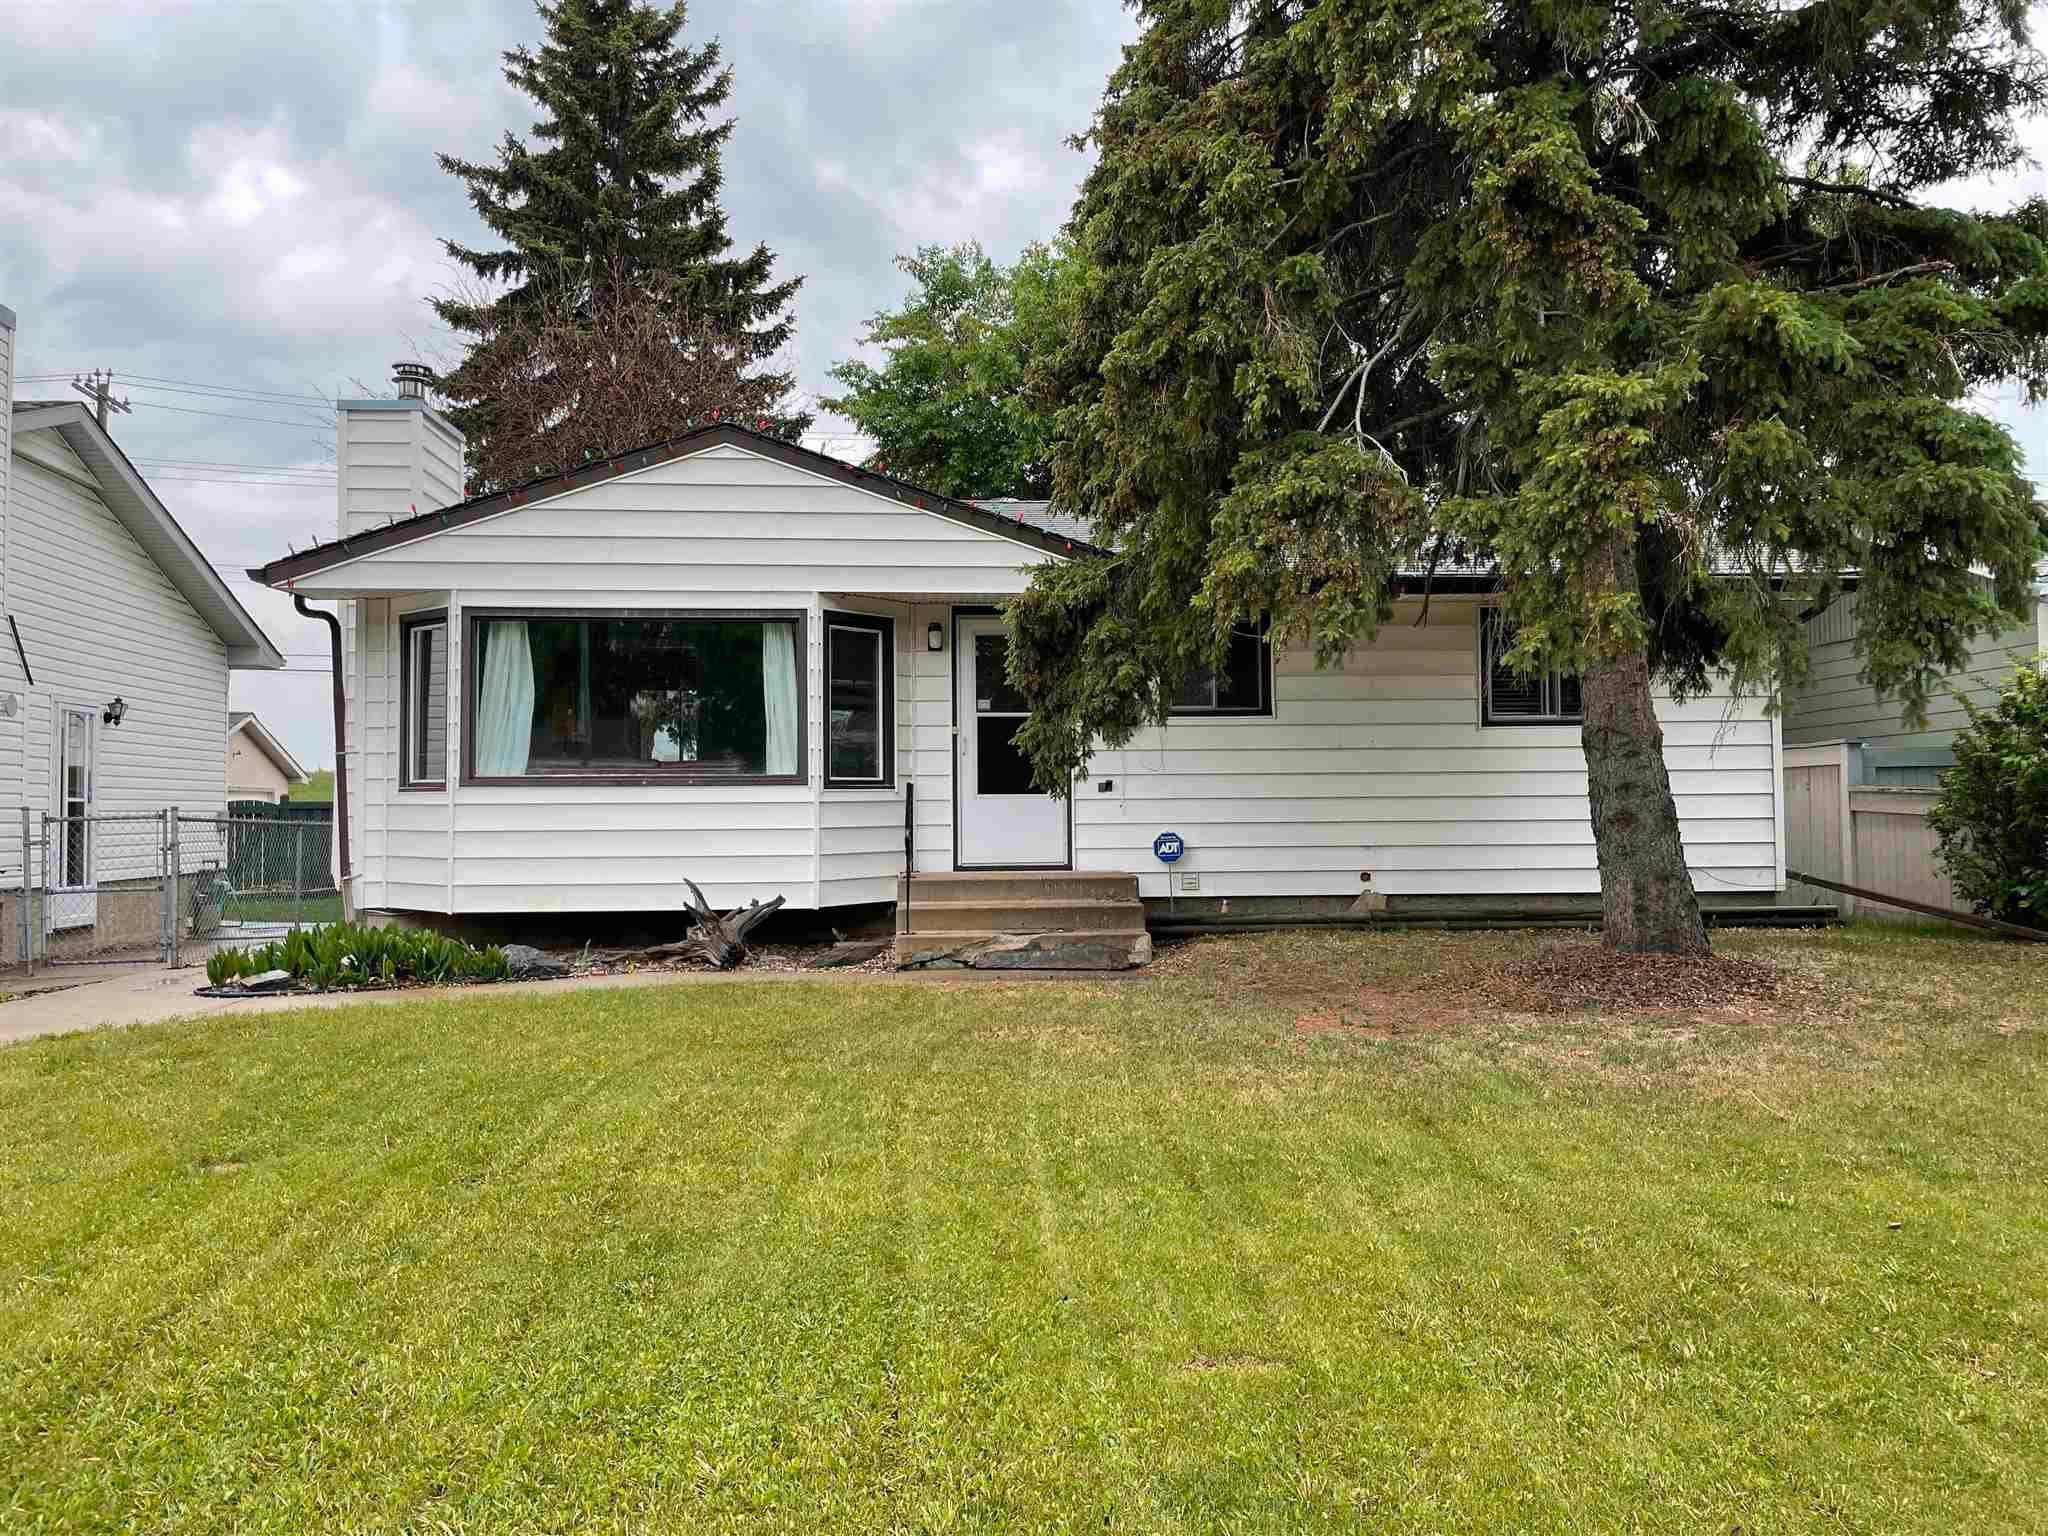 Main Photo: 16811 79A Avenue in Edmonton: Zone 22 House for sale : MLS®# E4249394